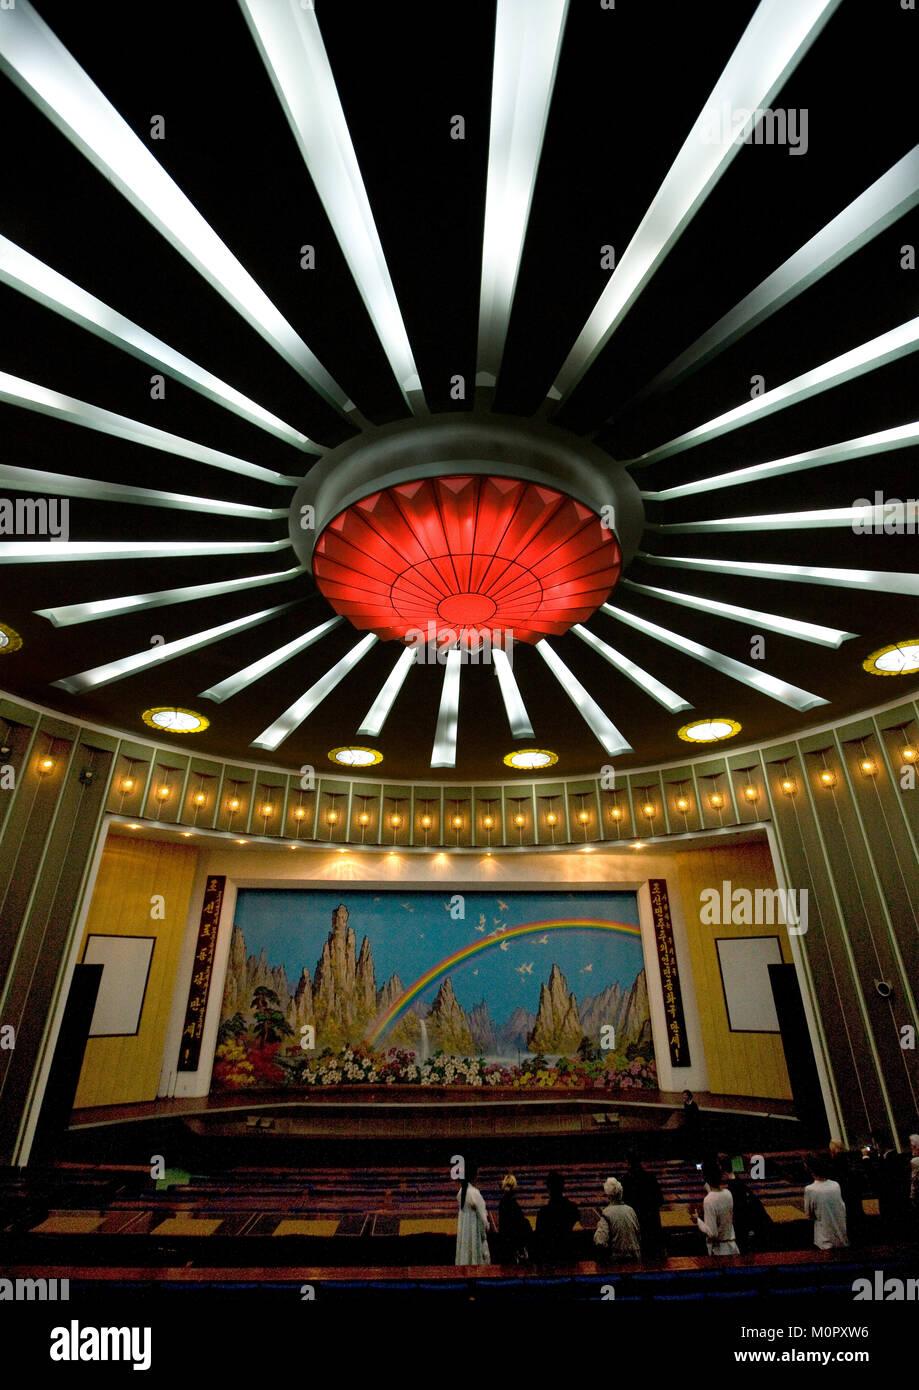 Theatre ceiling in Songdowon international children's camp, Kangwon Province, Wonsan, North Korea - Stock Image